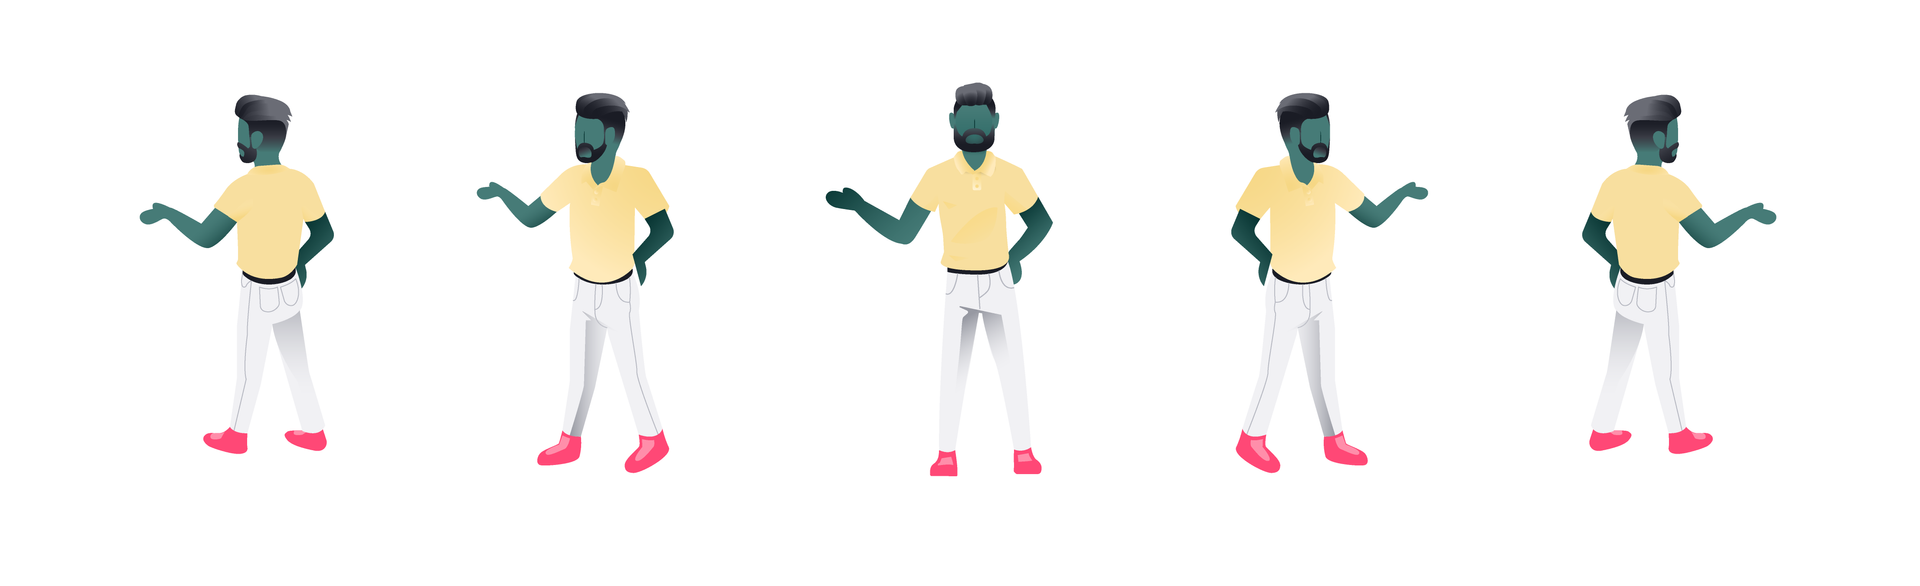 Jeff- Illustration Style